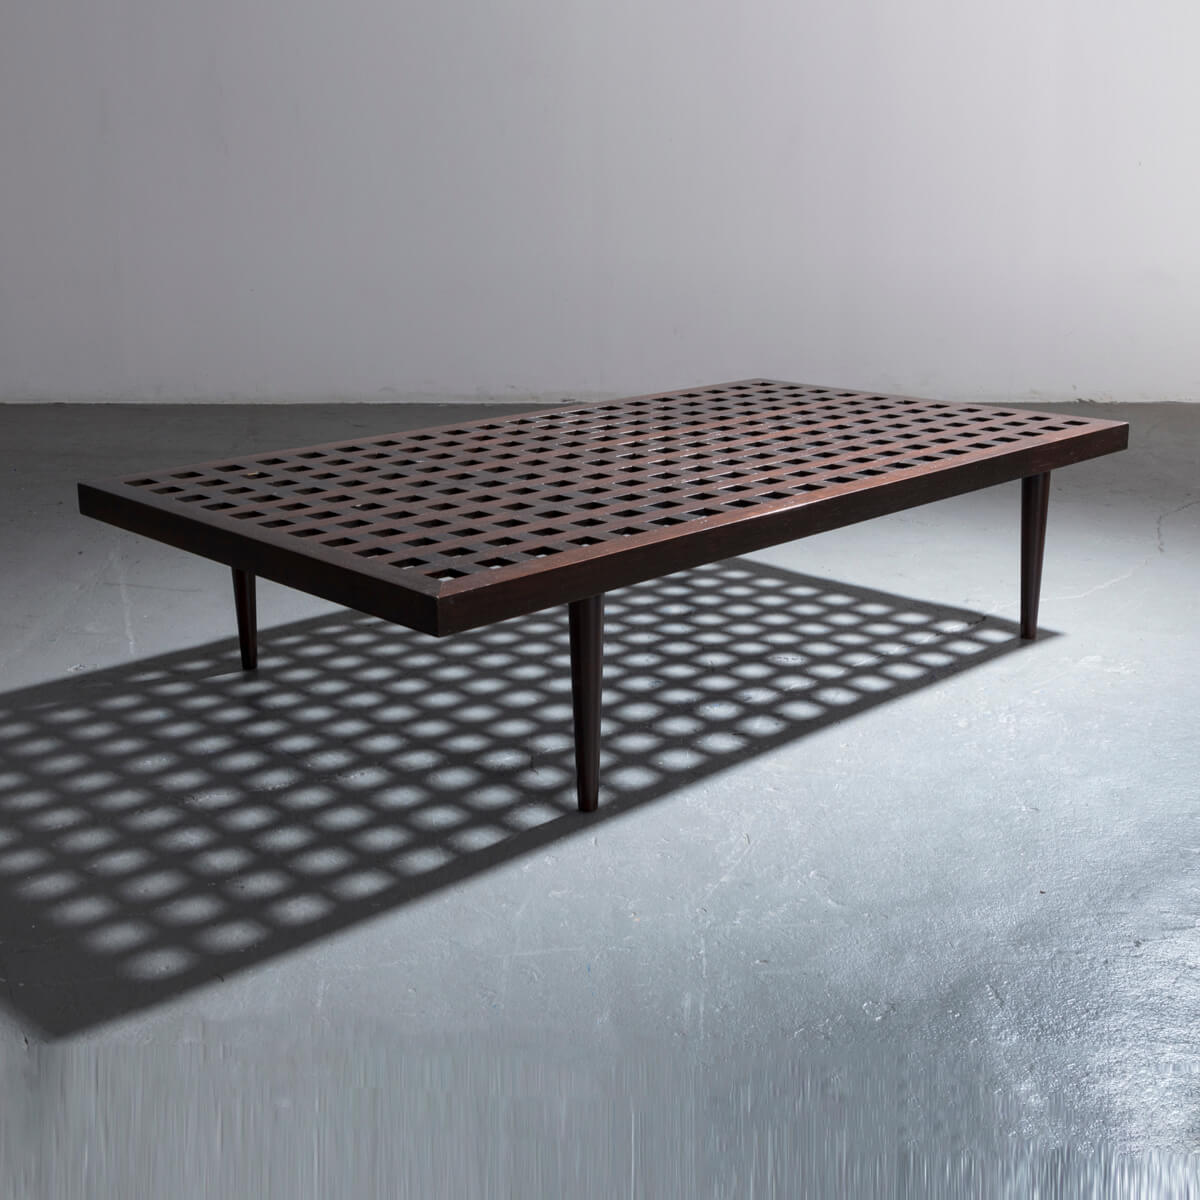 Checkerboard Coffee Table In Ebonized Wood By Joaquim Tenreiro (CT1023) | R  U0026 Company